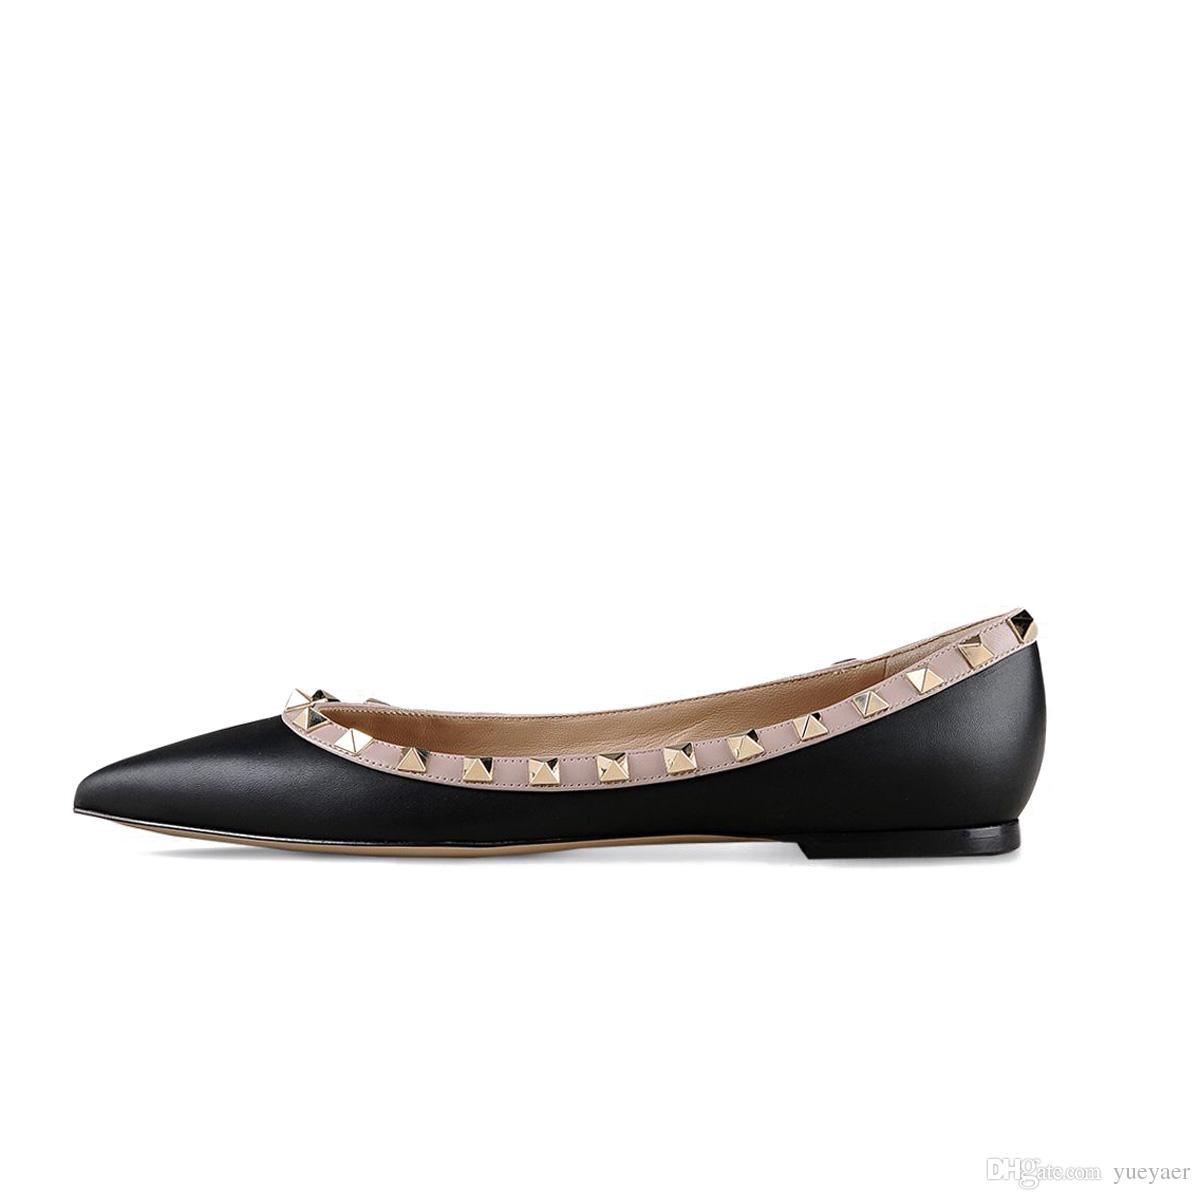 Zandina Women Handcrafted Fashion Ballerina Flat Shoes Ballets Pointy Studded Slip On Flat Party Pumps Yellow